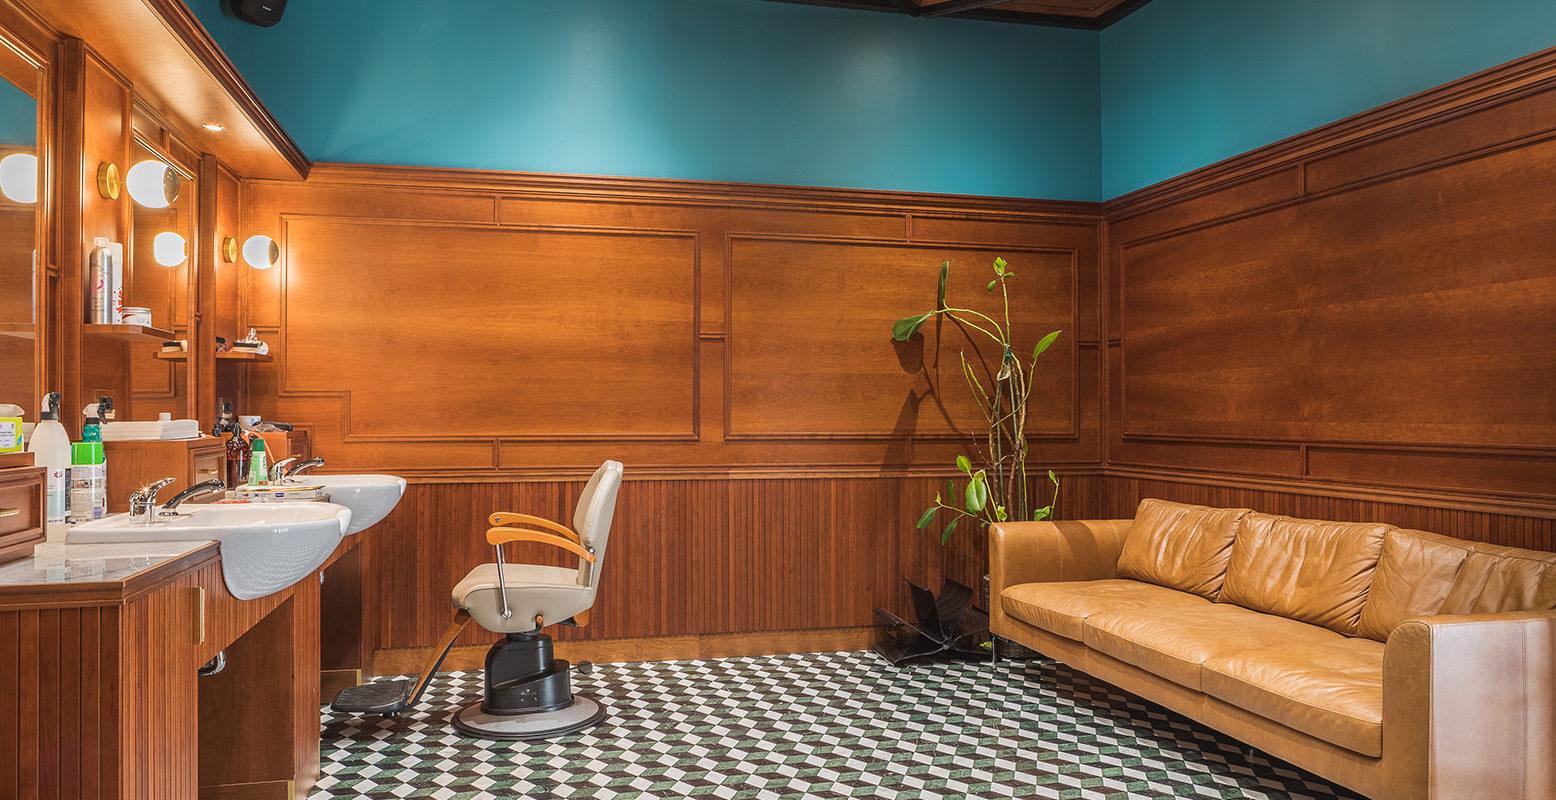 Barberia dal 1970